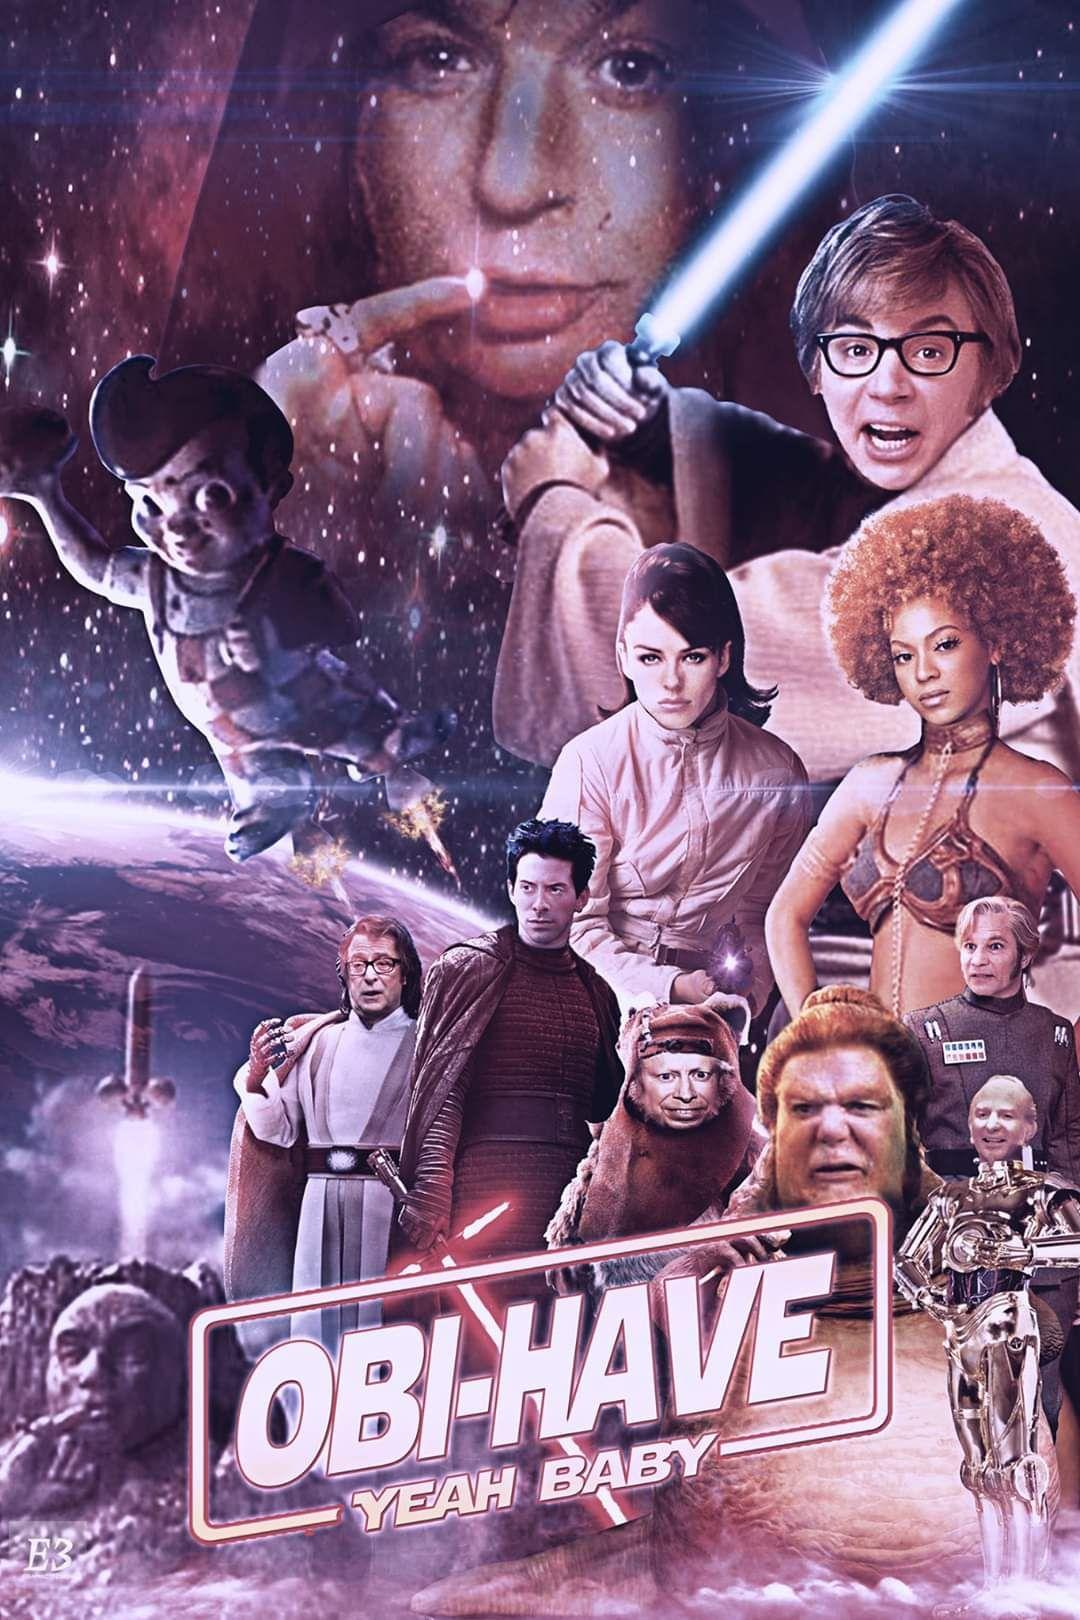 new austin powers movie poster